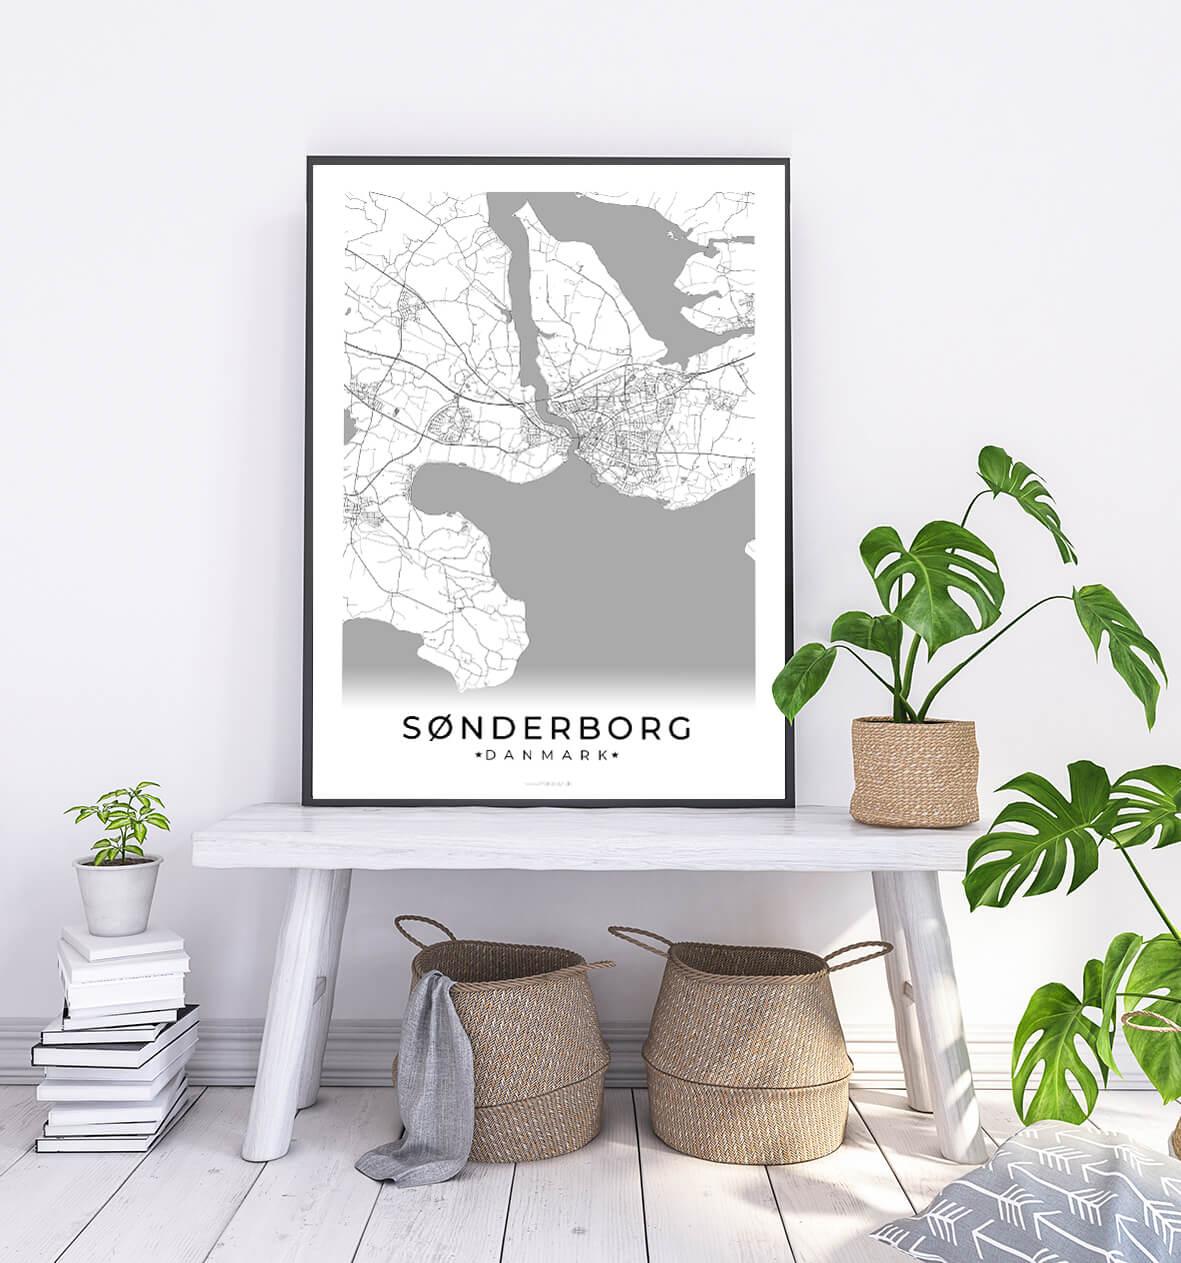 Soenderborg-hvid-byplakat-1